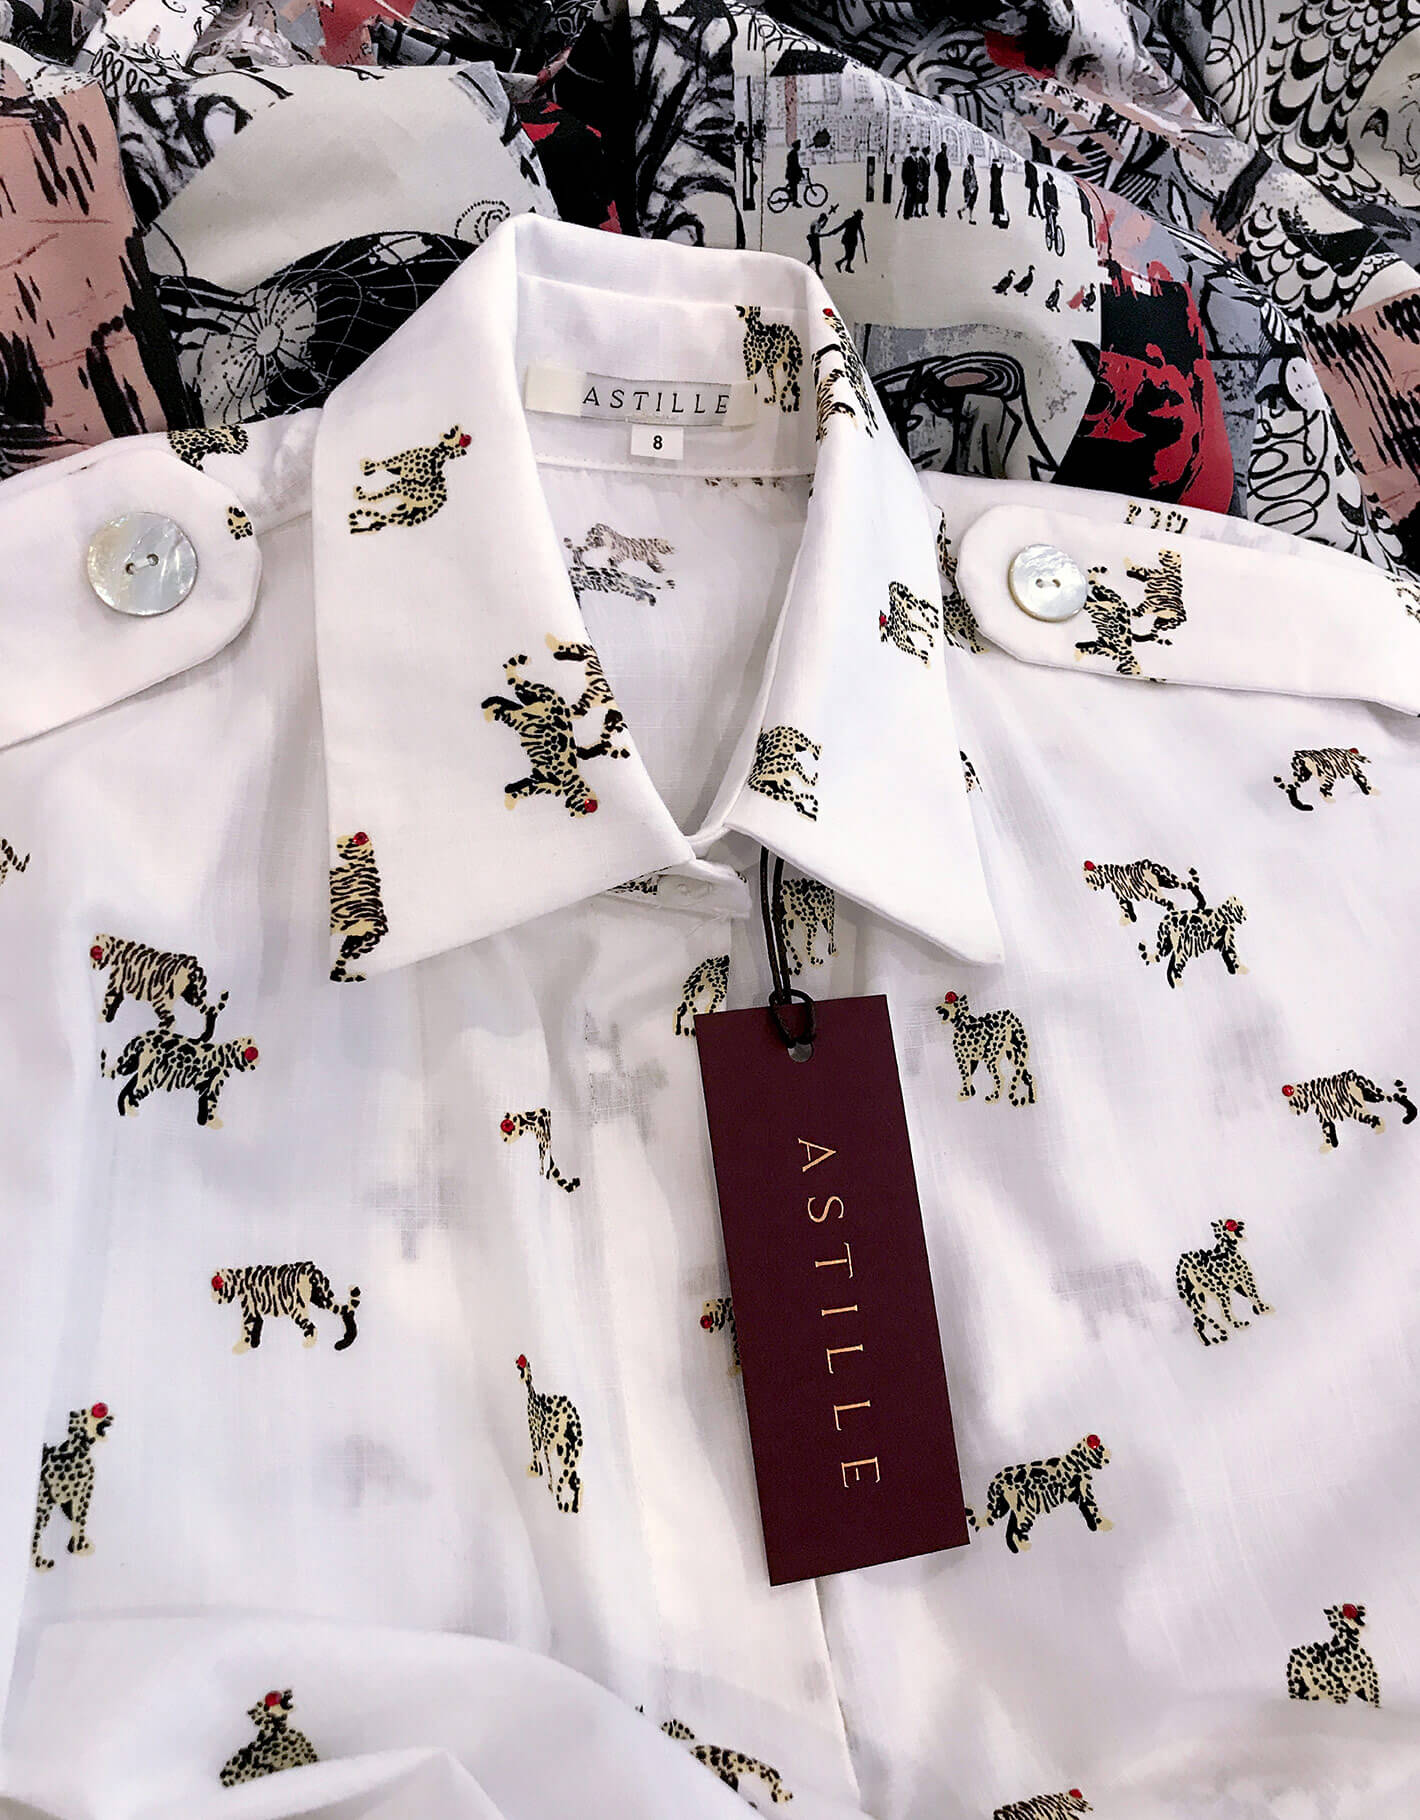 Astille foiled swingtag sity on Leopard print shirt dress by Astille Designs